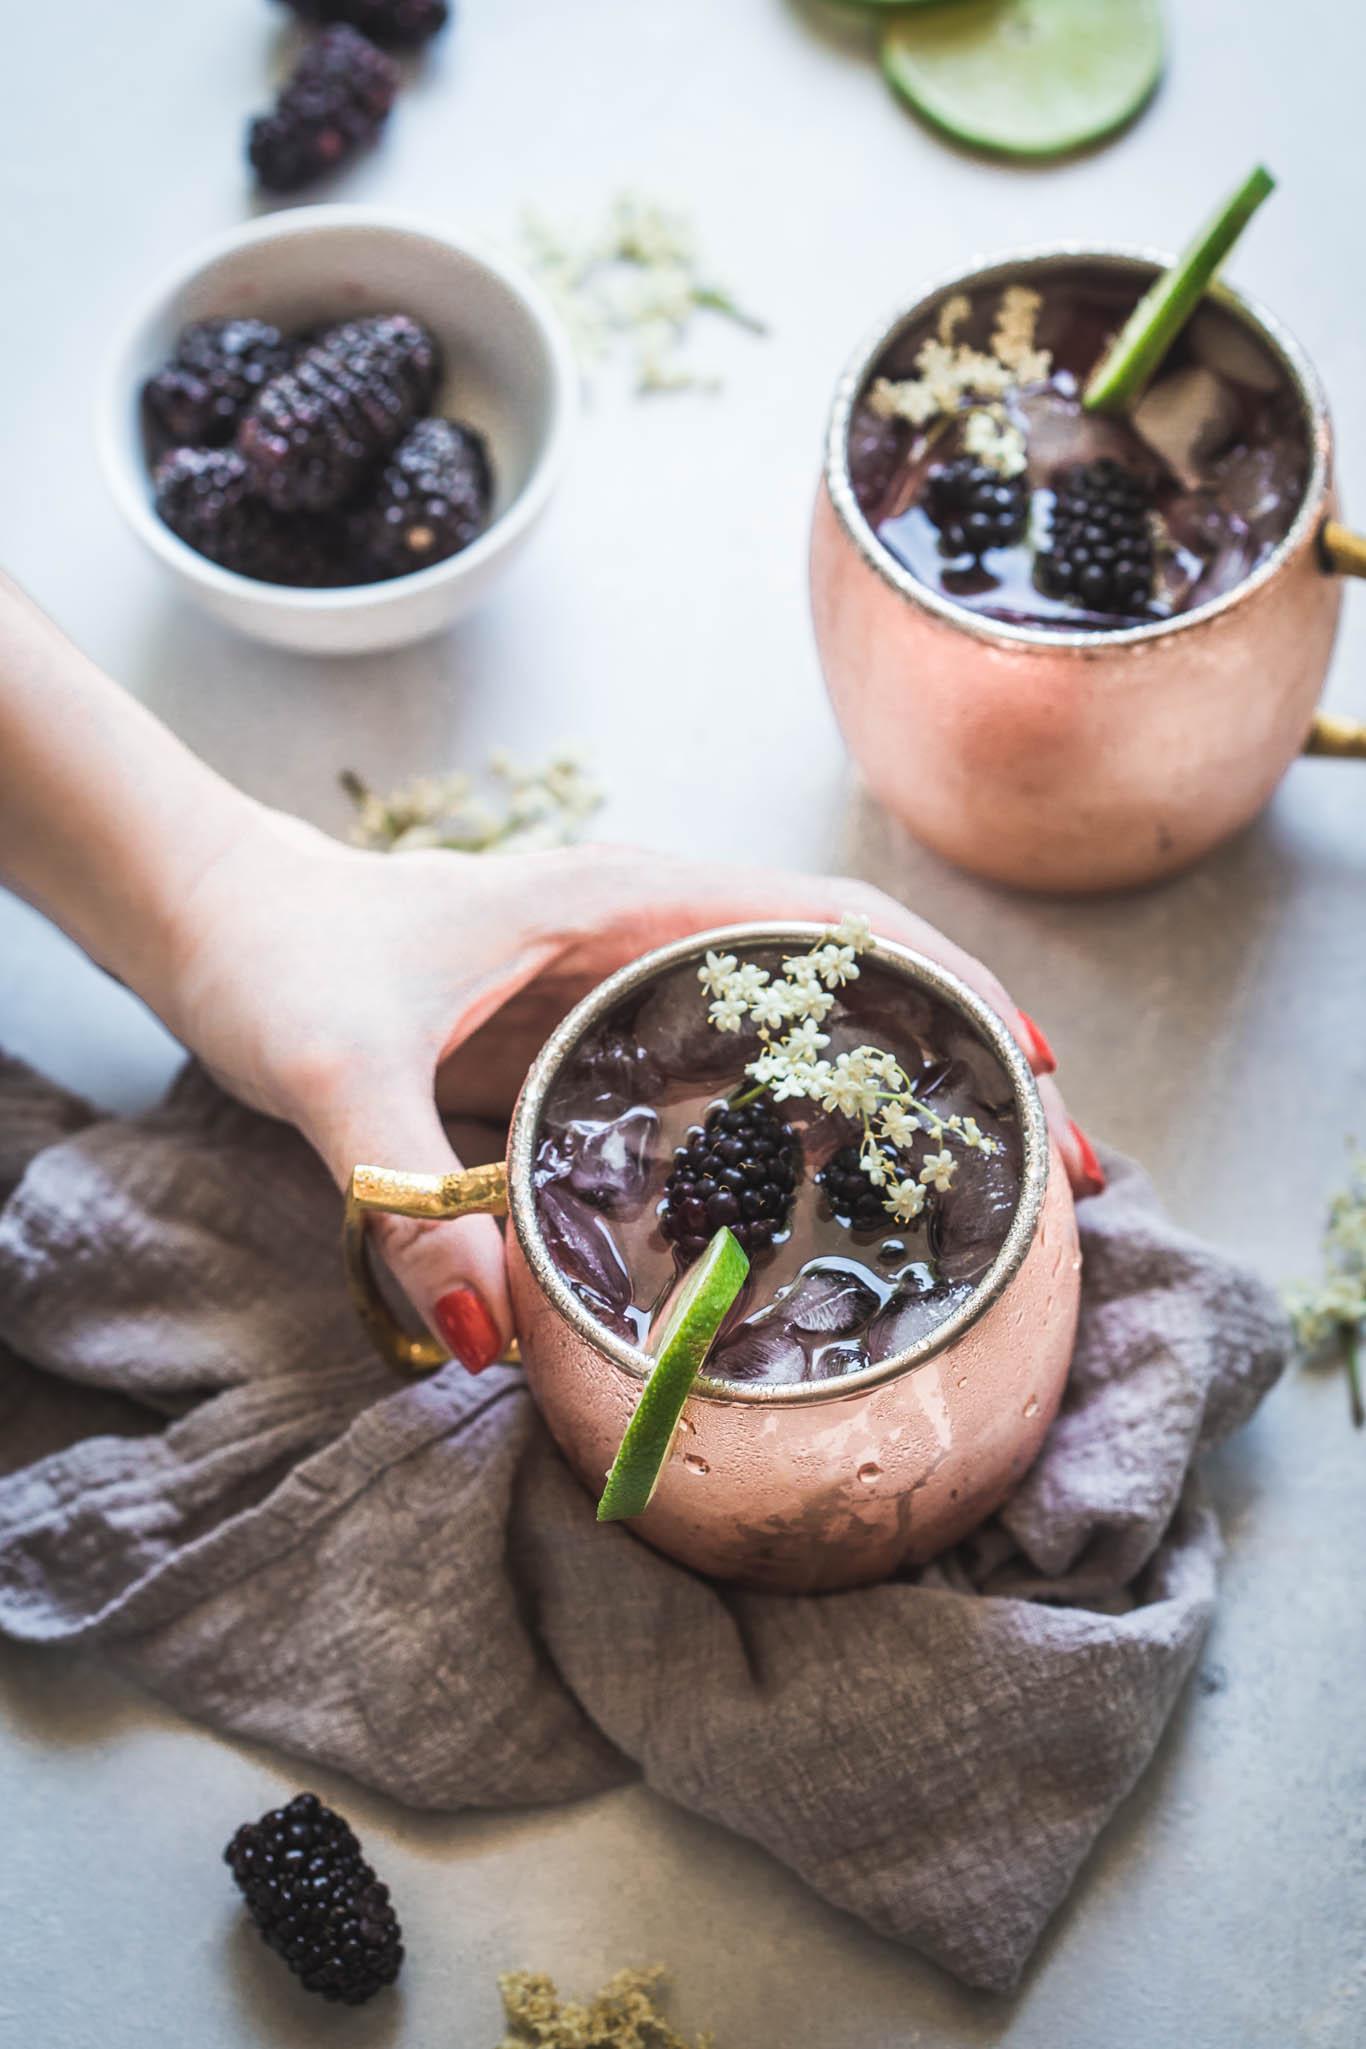 Hand holding copper mug